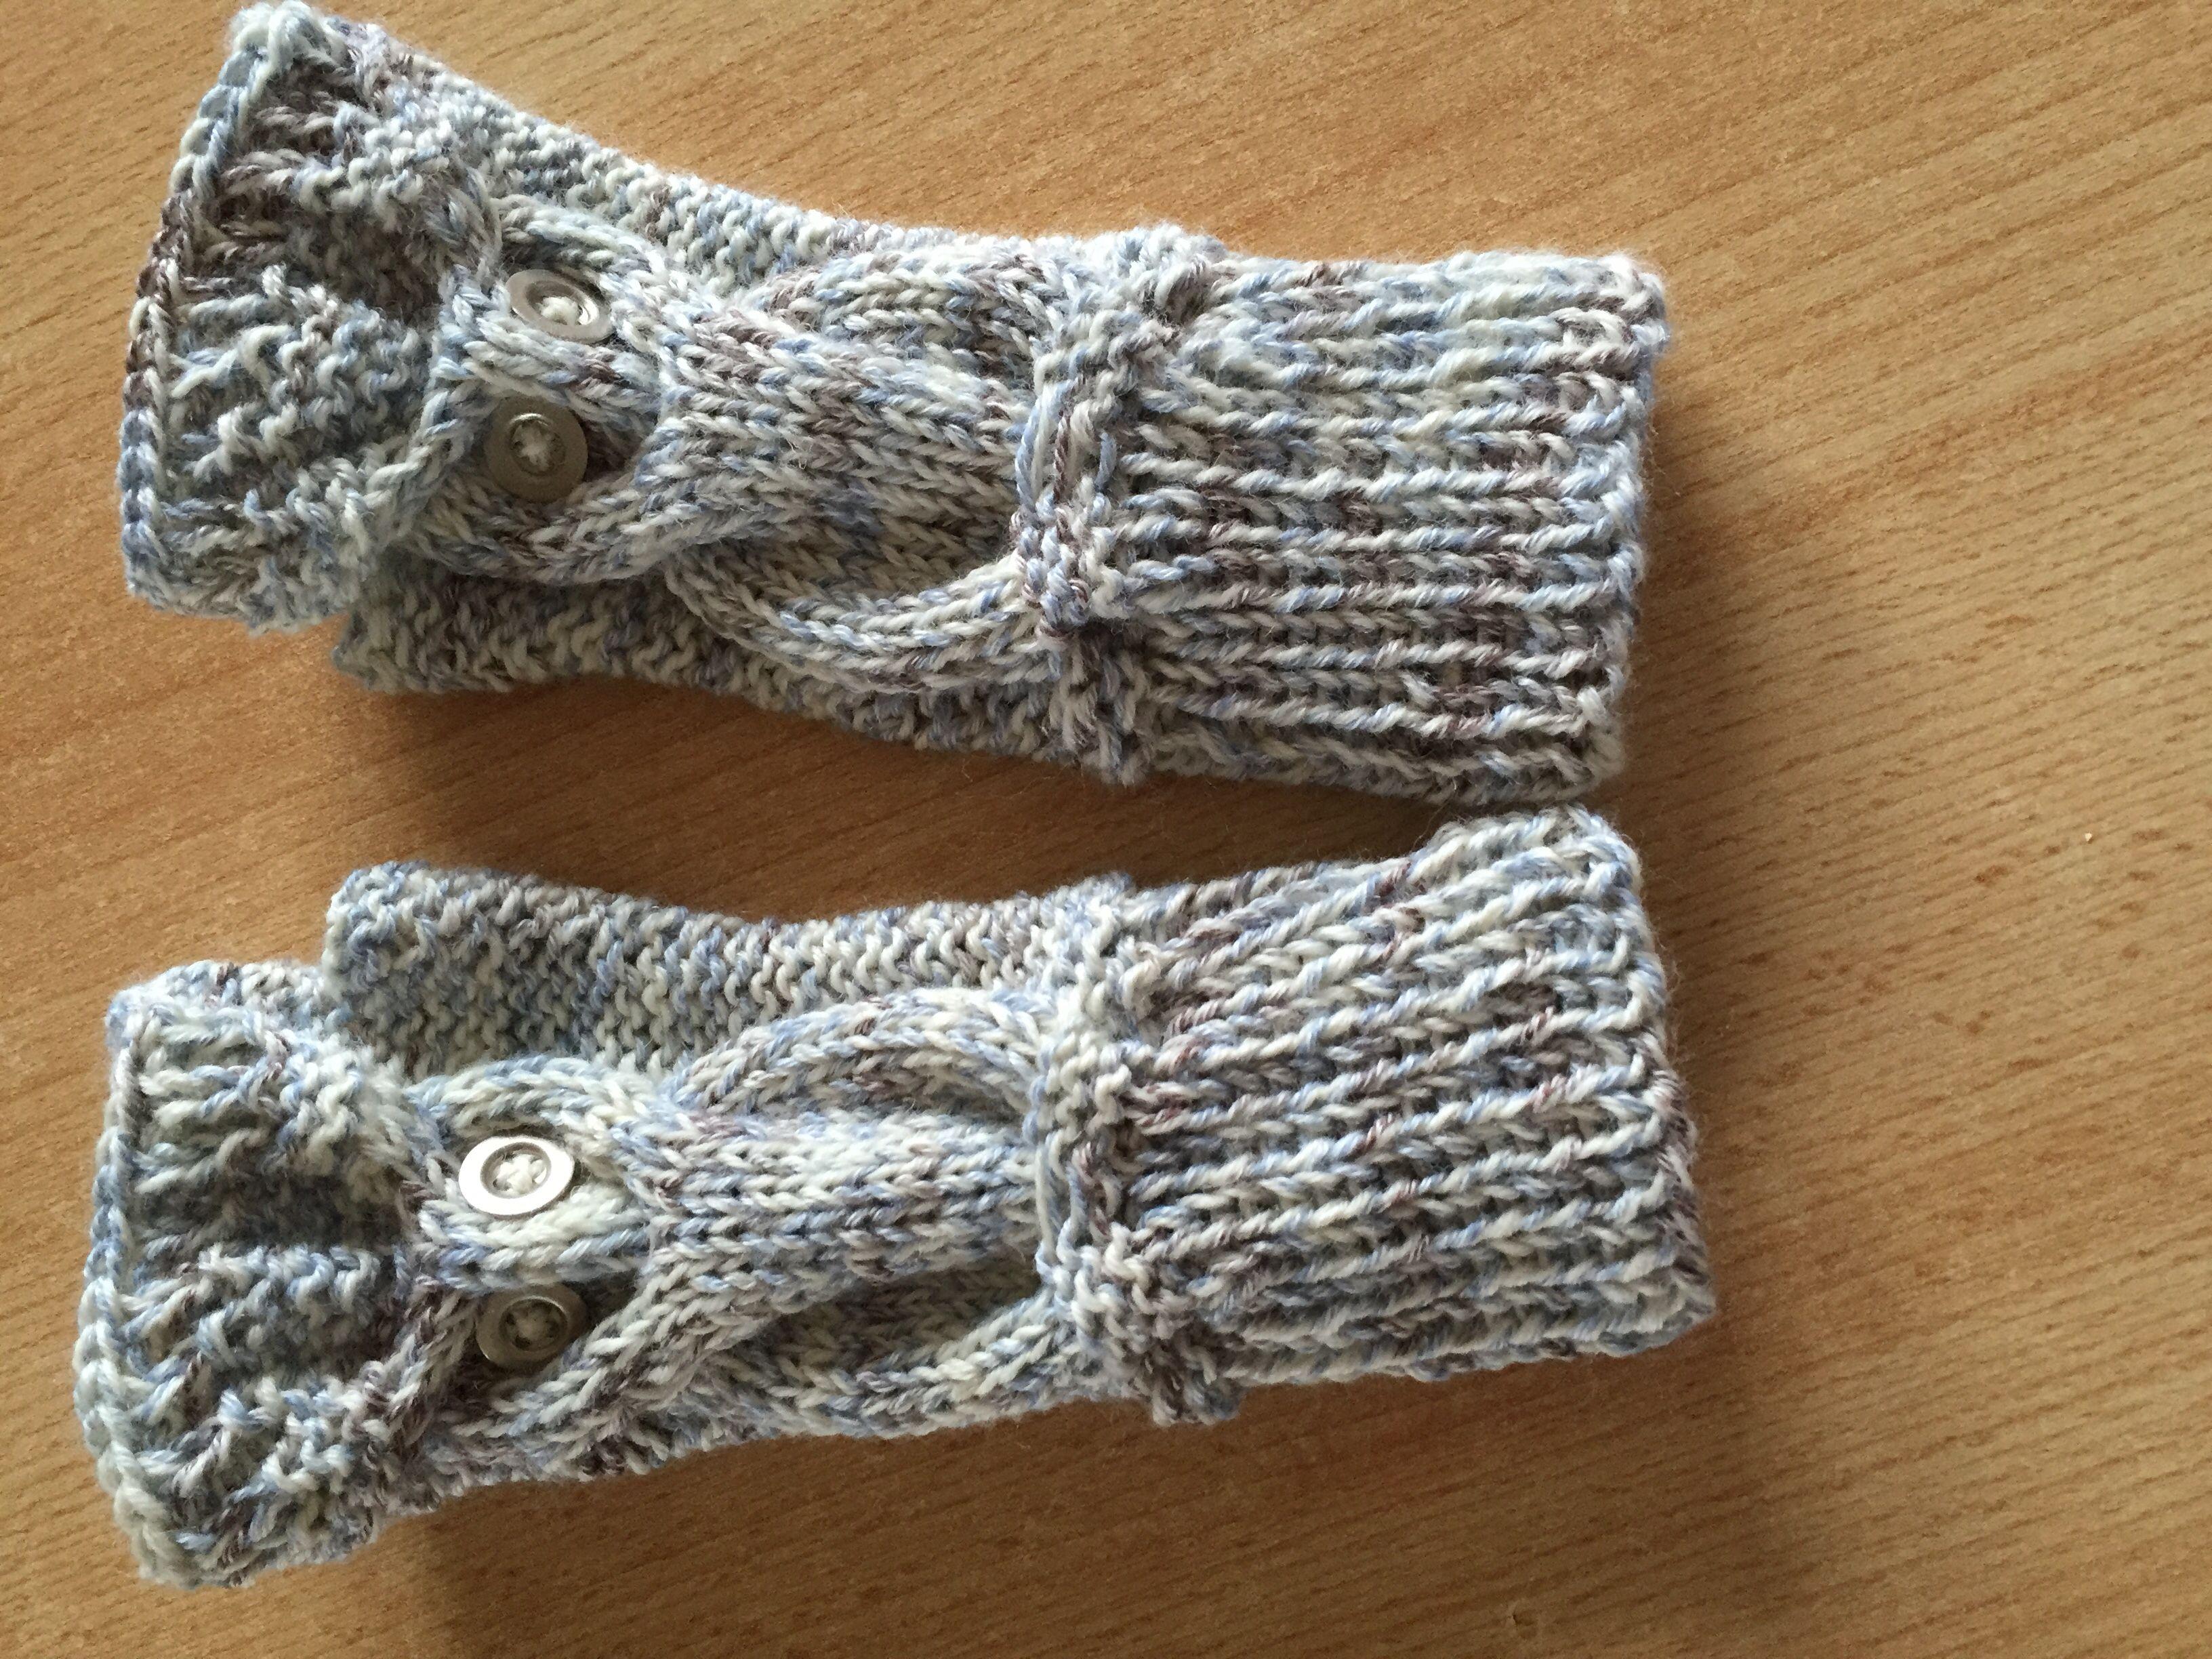 Funky Frei Stricken Fingerlose Handschuhe Muster Festooning - Decke ...